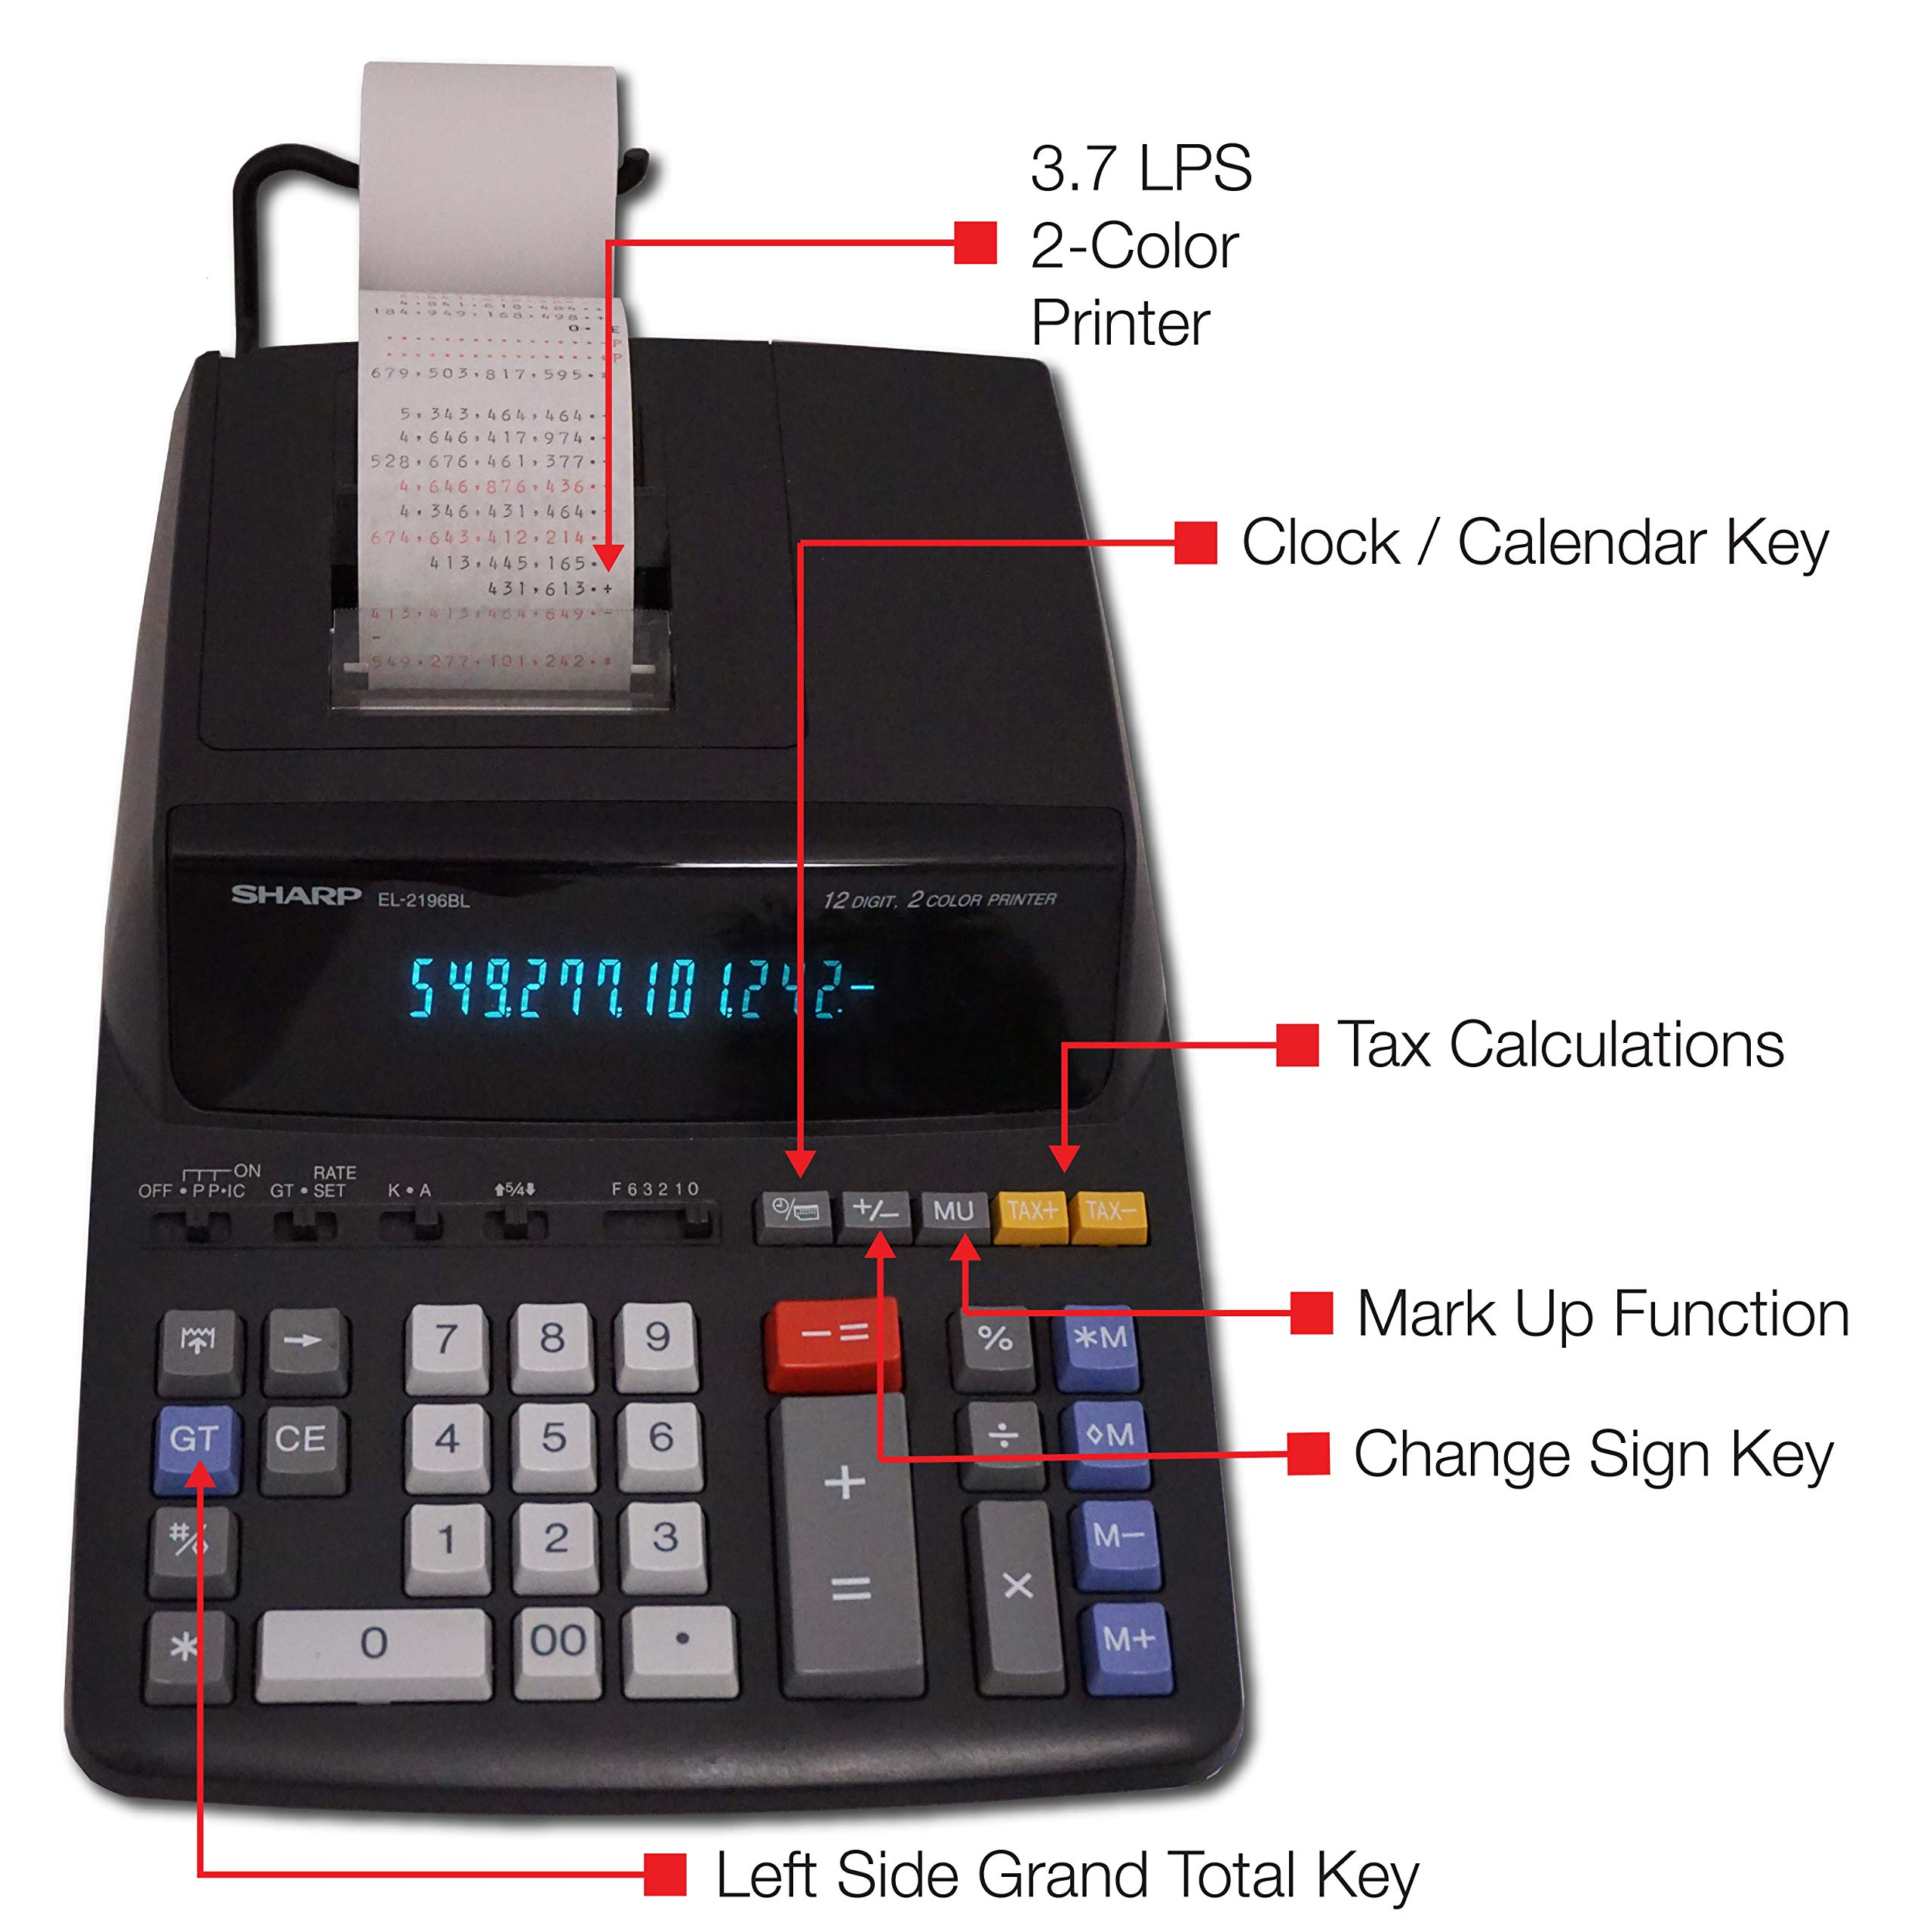 Sharp EL-2196BL 12 Digit Printing Calculator by Sharp